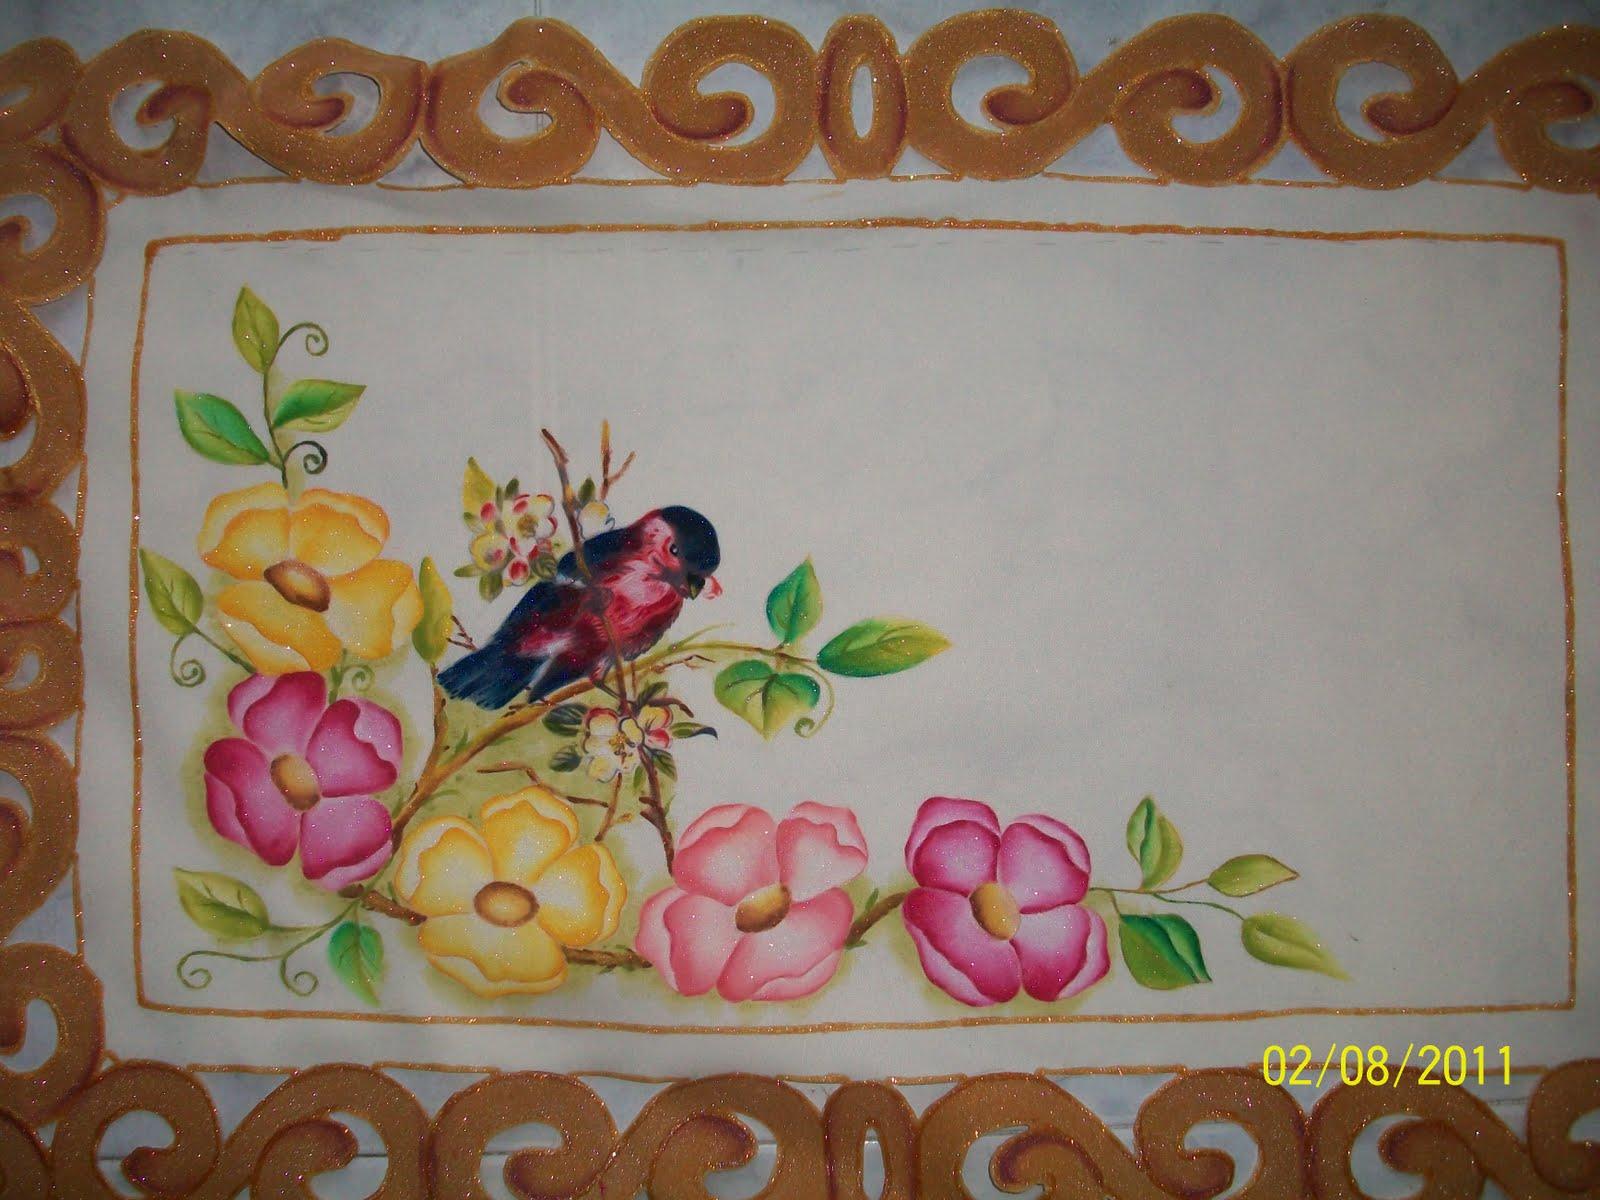 Amararte manualidades pintura en tela carpetas cuadros - Imagenes de mesas con manteles ...